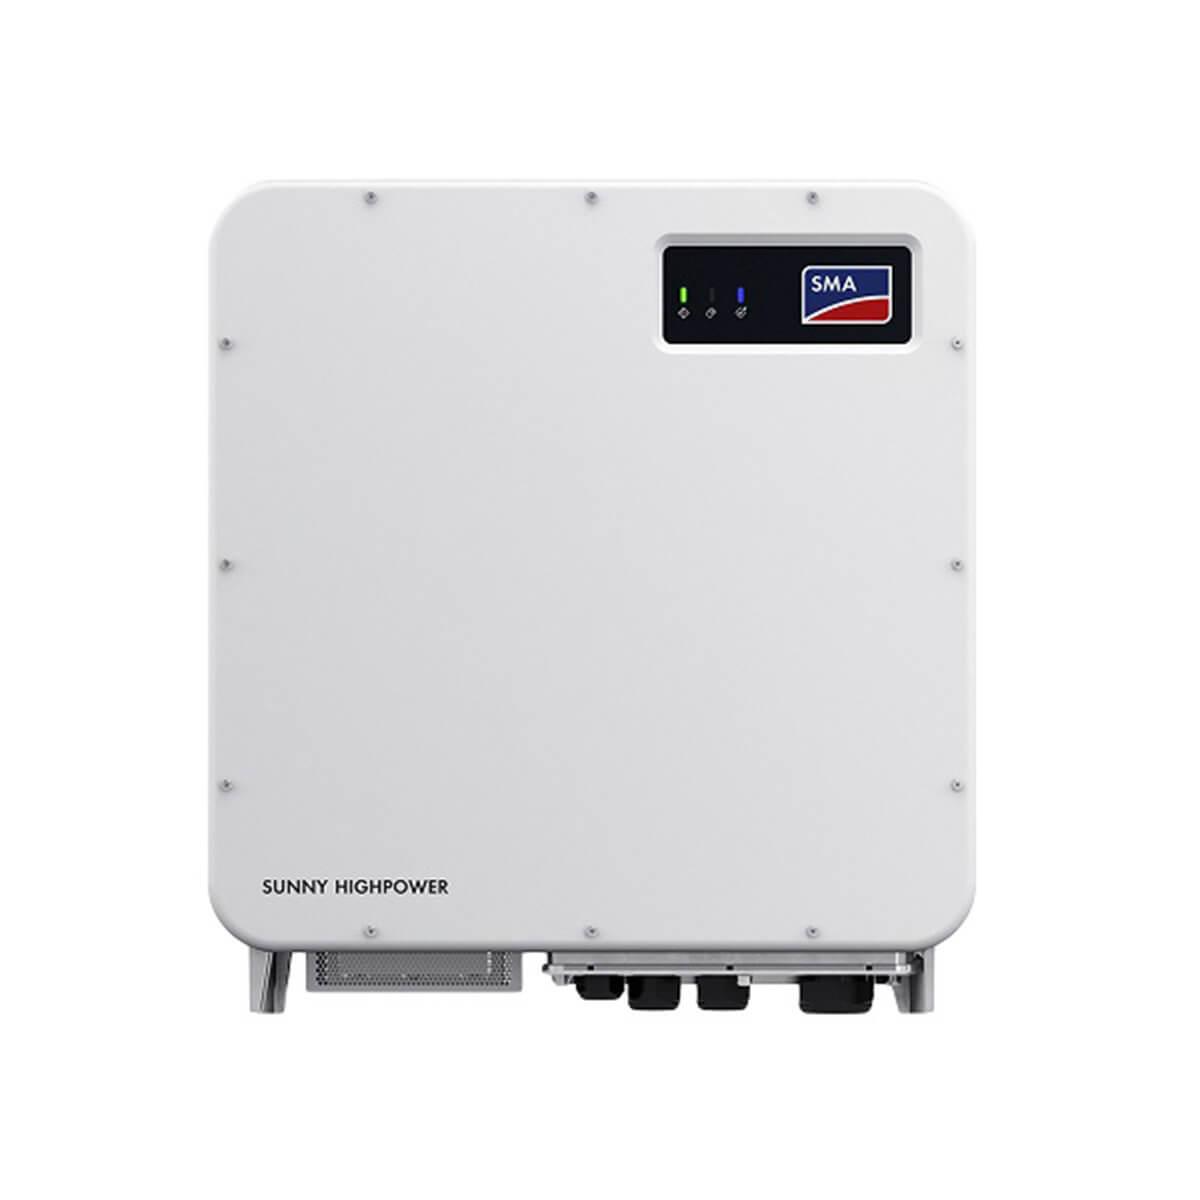 sma 100kW inverter, sma sunny highpower 100kW inverter, sma sunny highpower 100-20 inverter, sma sunny highpower 100-20, sma sunny highpower 100 kW